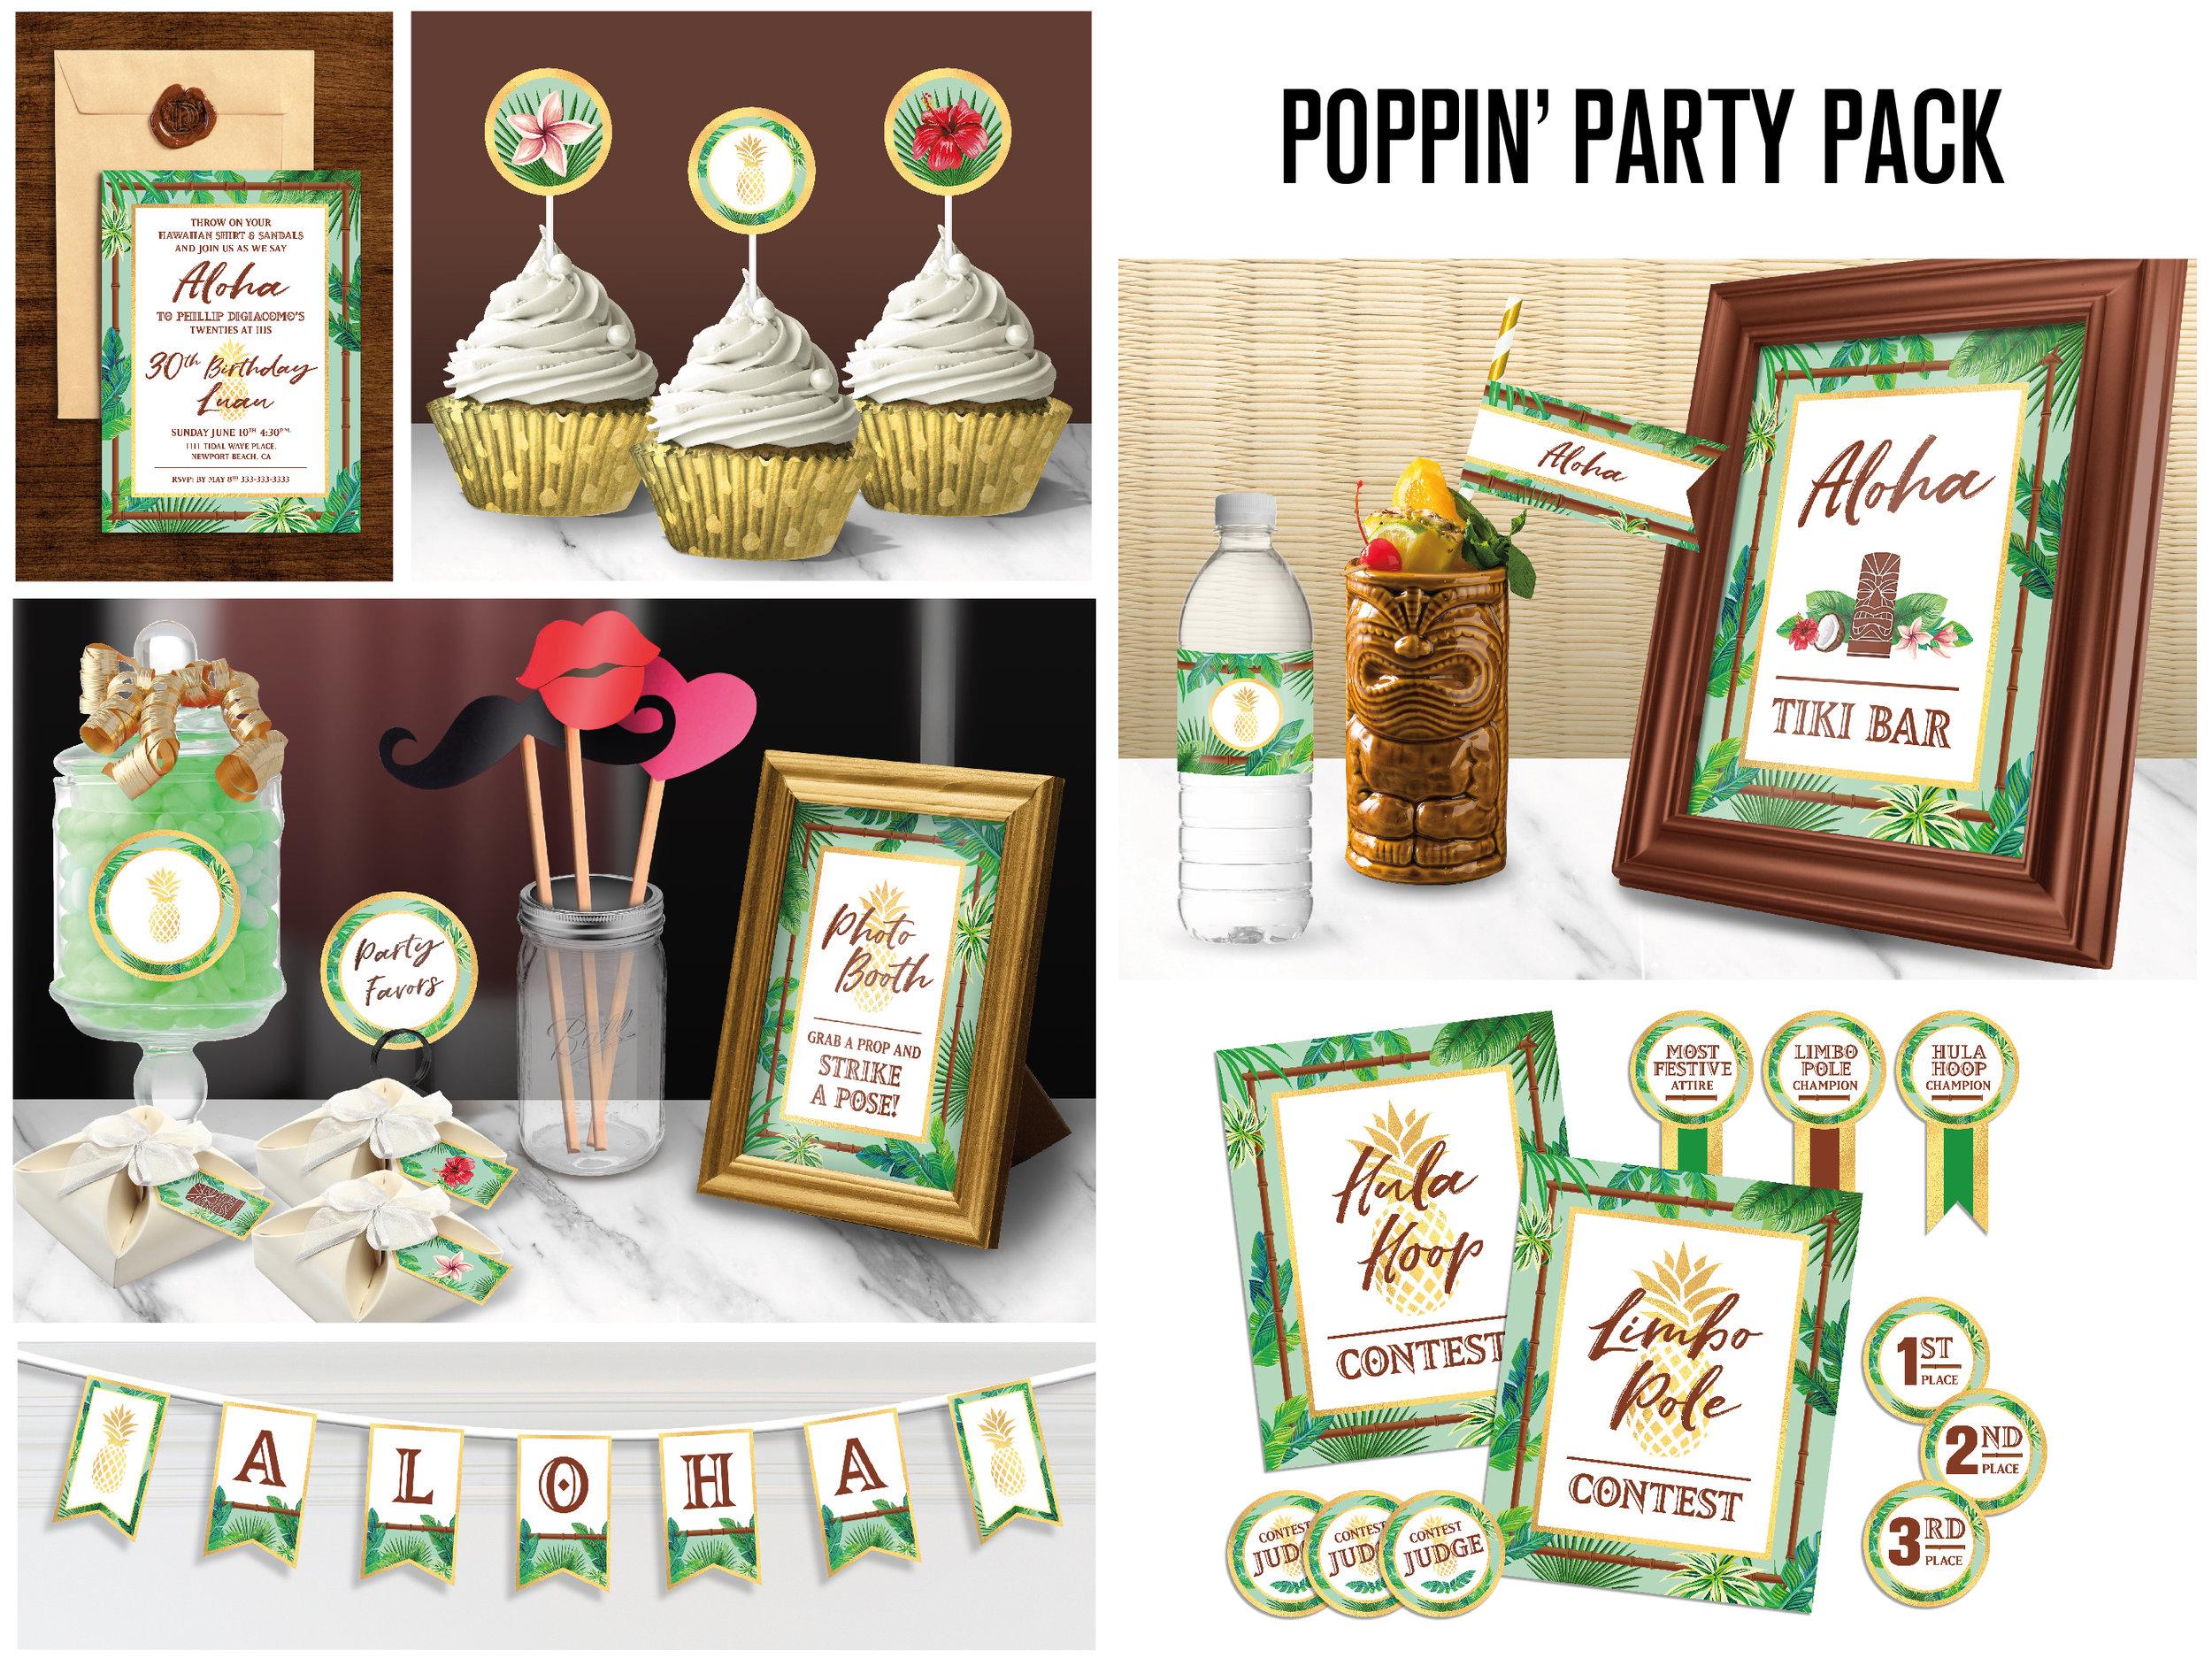 Luau_PoppinPartyPack_Image-03.jpg